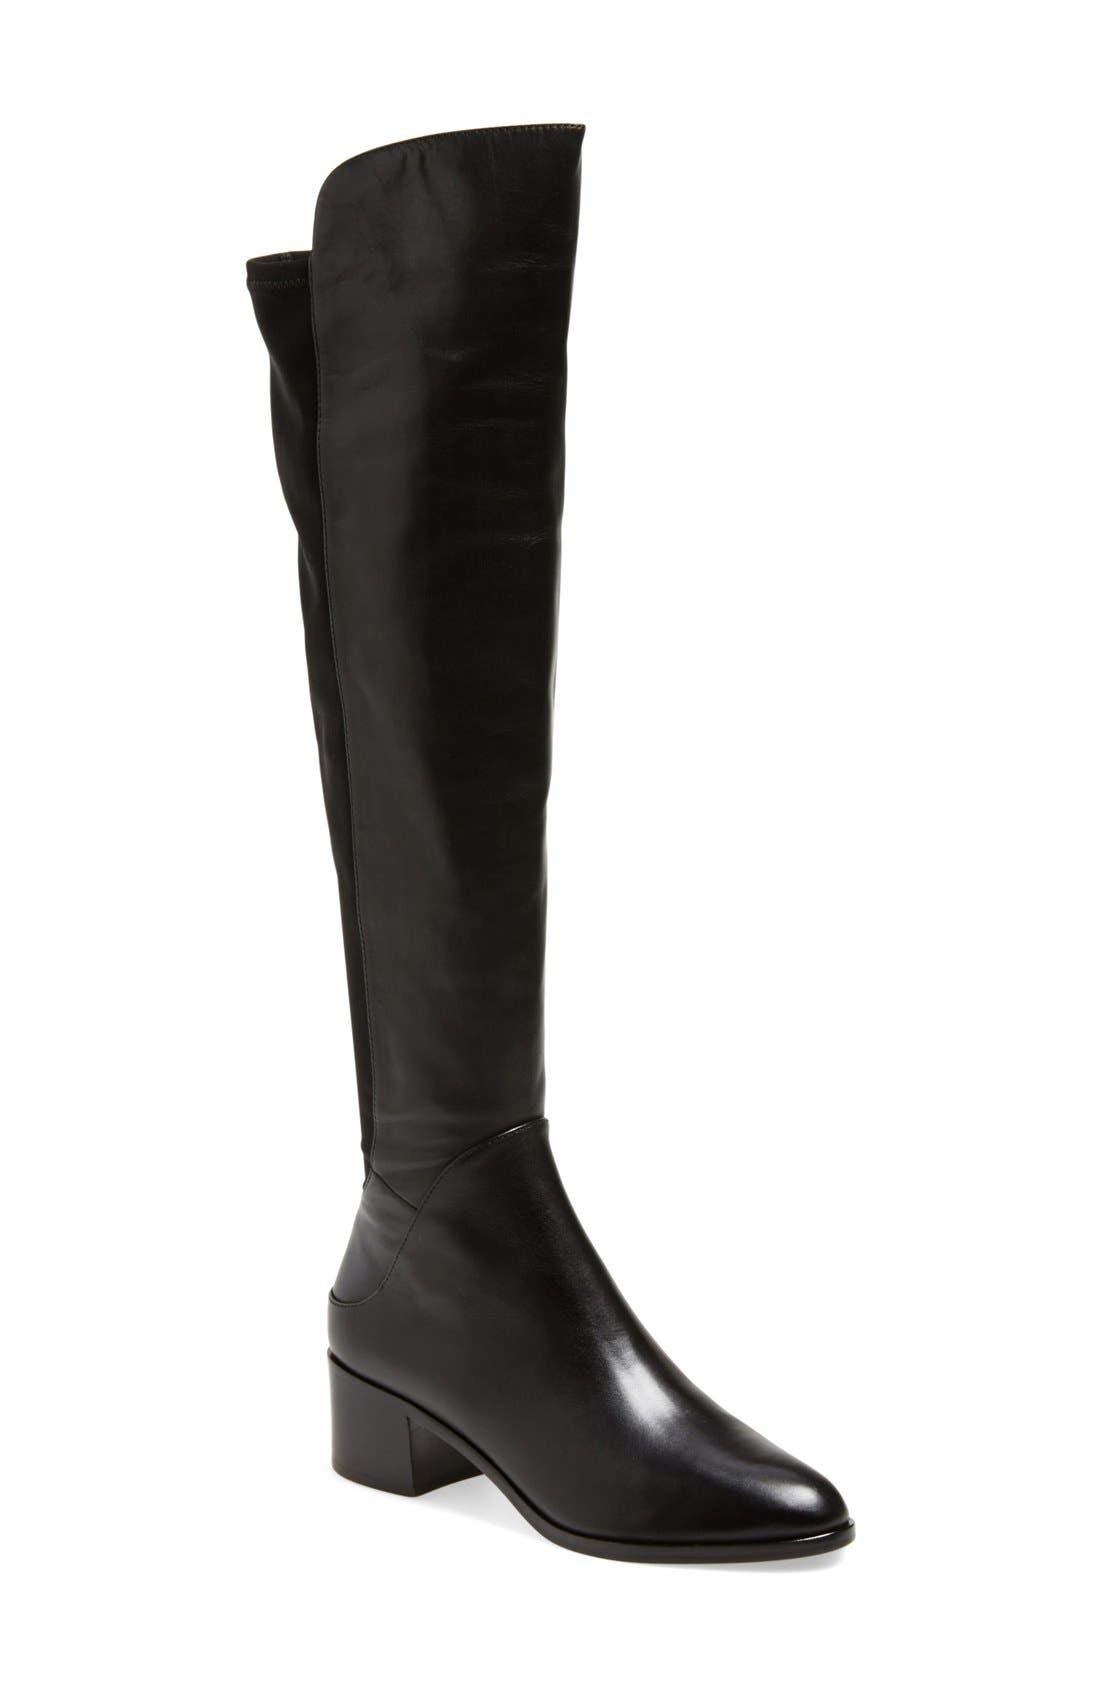 Alternate Image 1 Selected - Via Spiga 'Alto' Over the Knee Boot (Women)